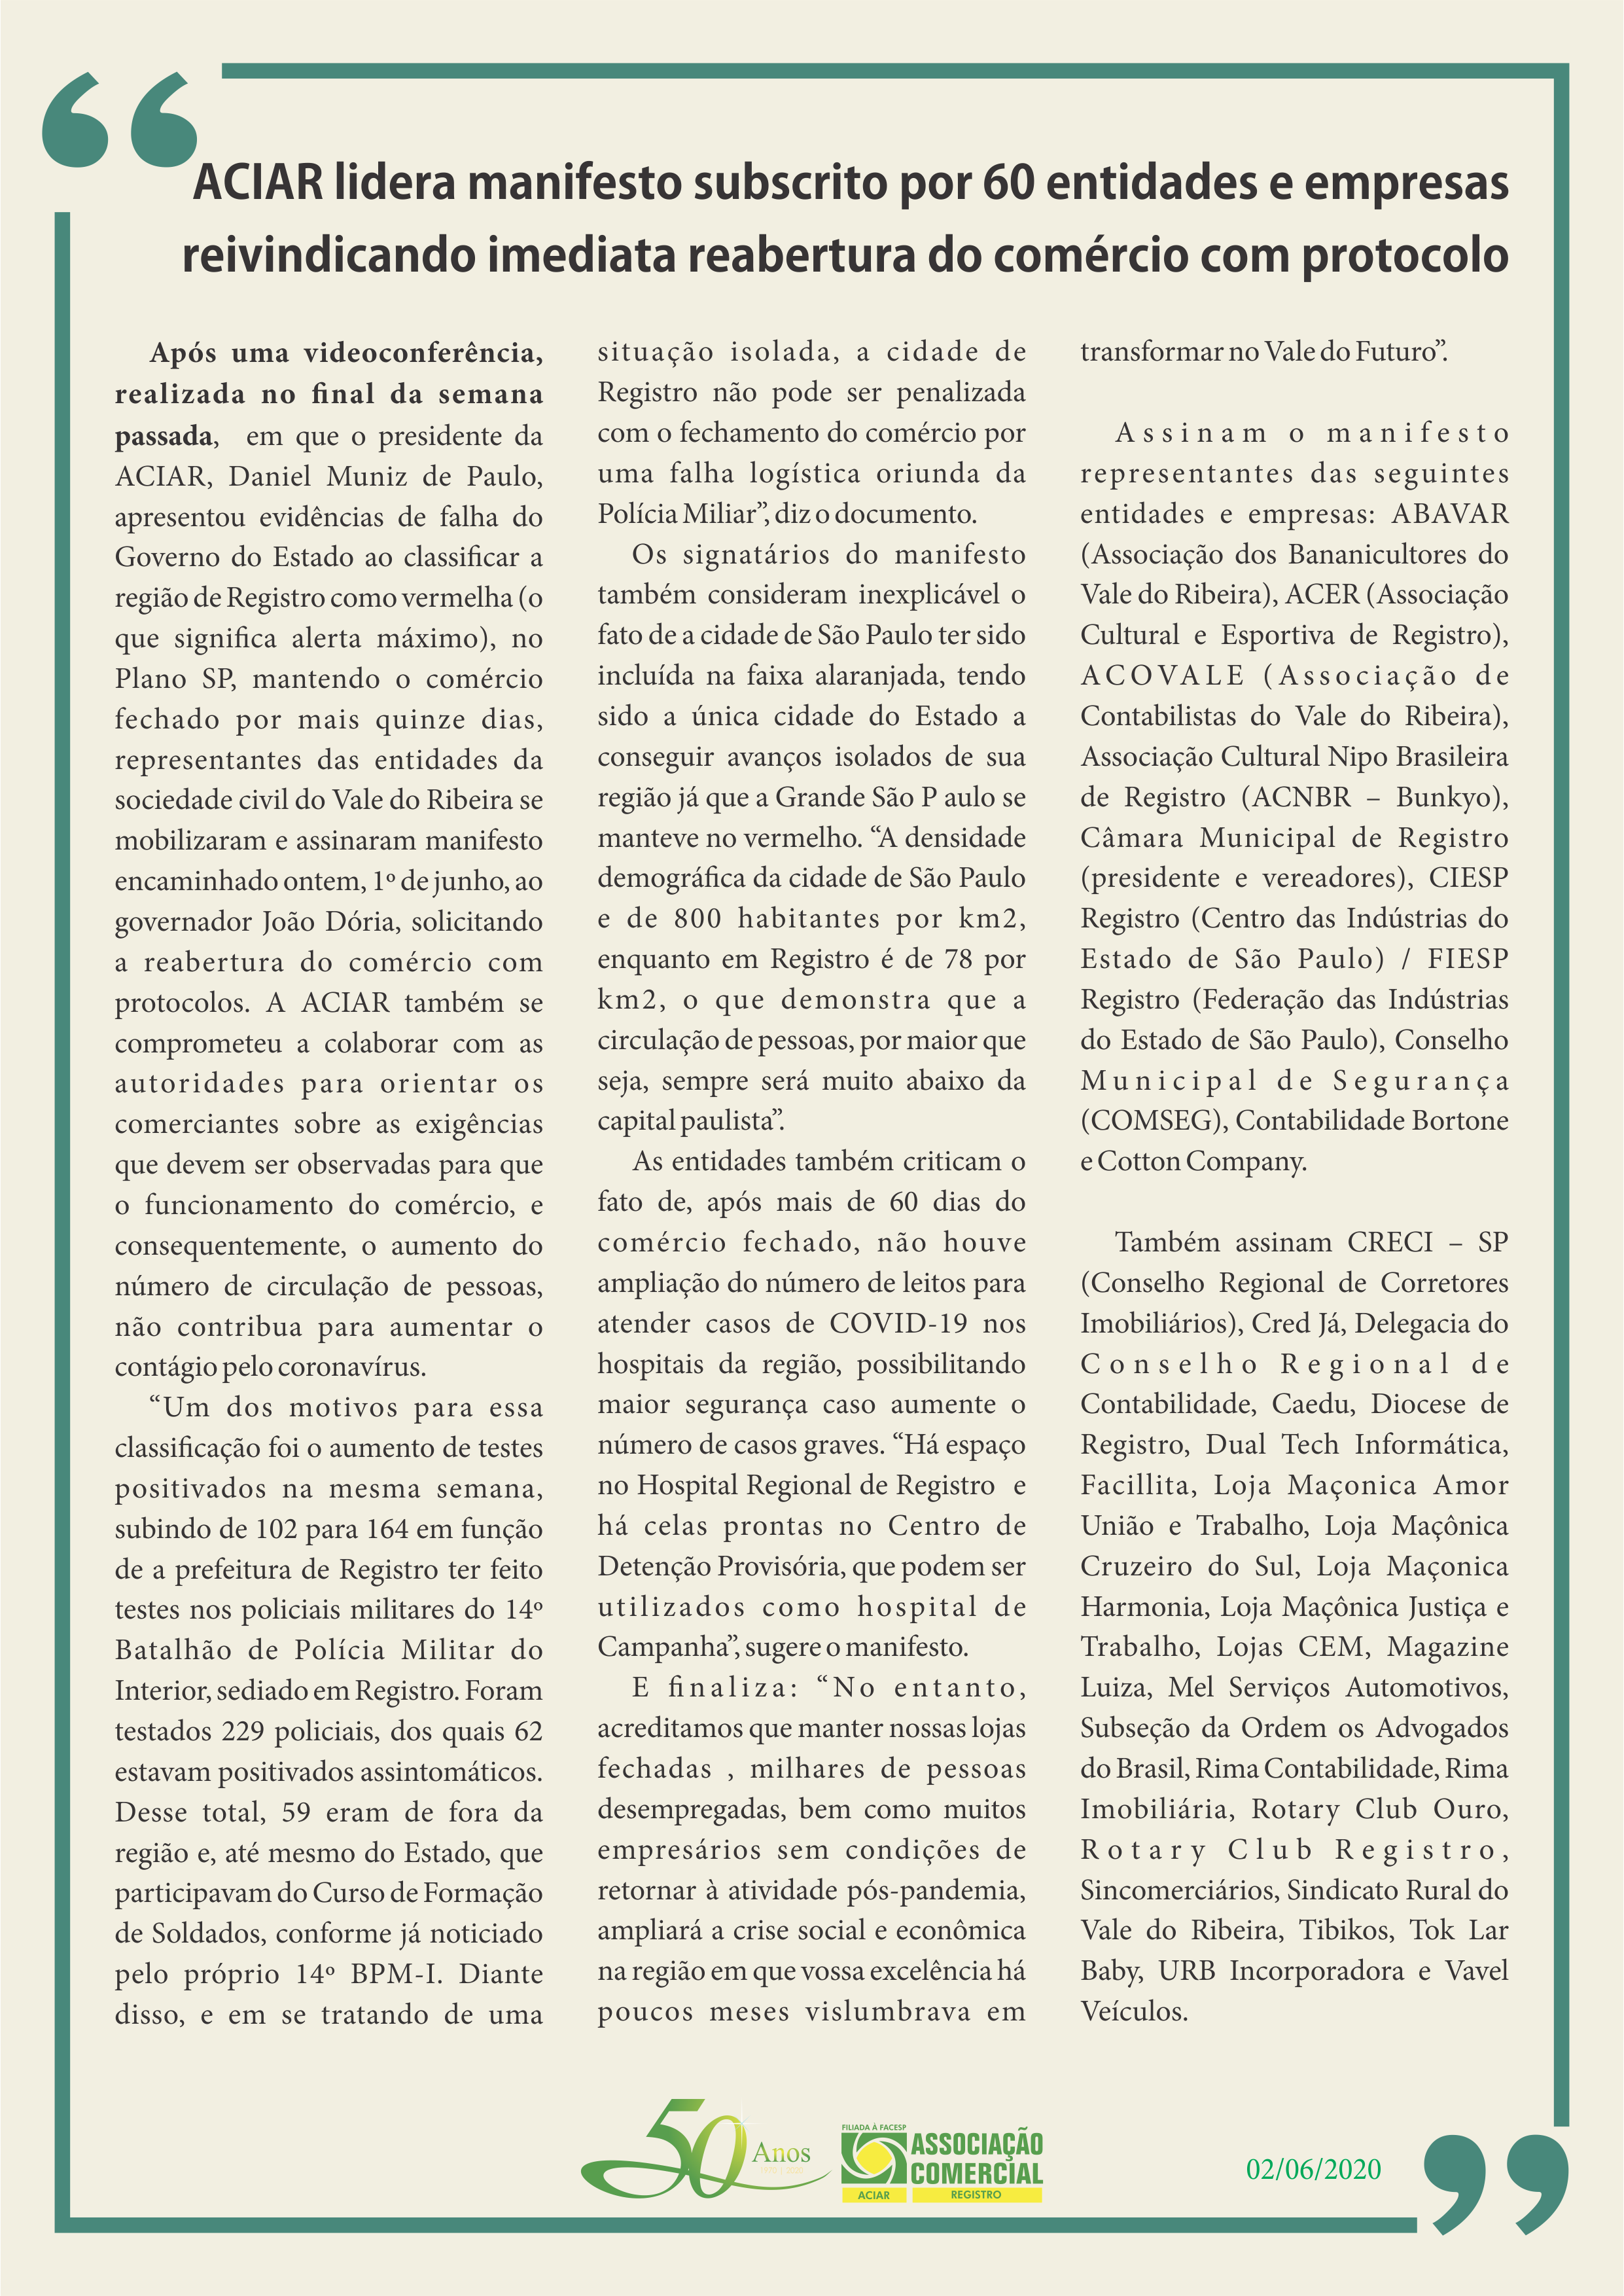 Manifesto - ACIAR